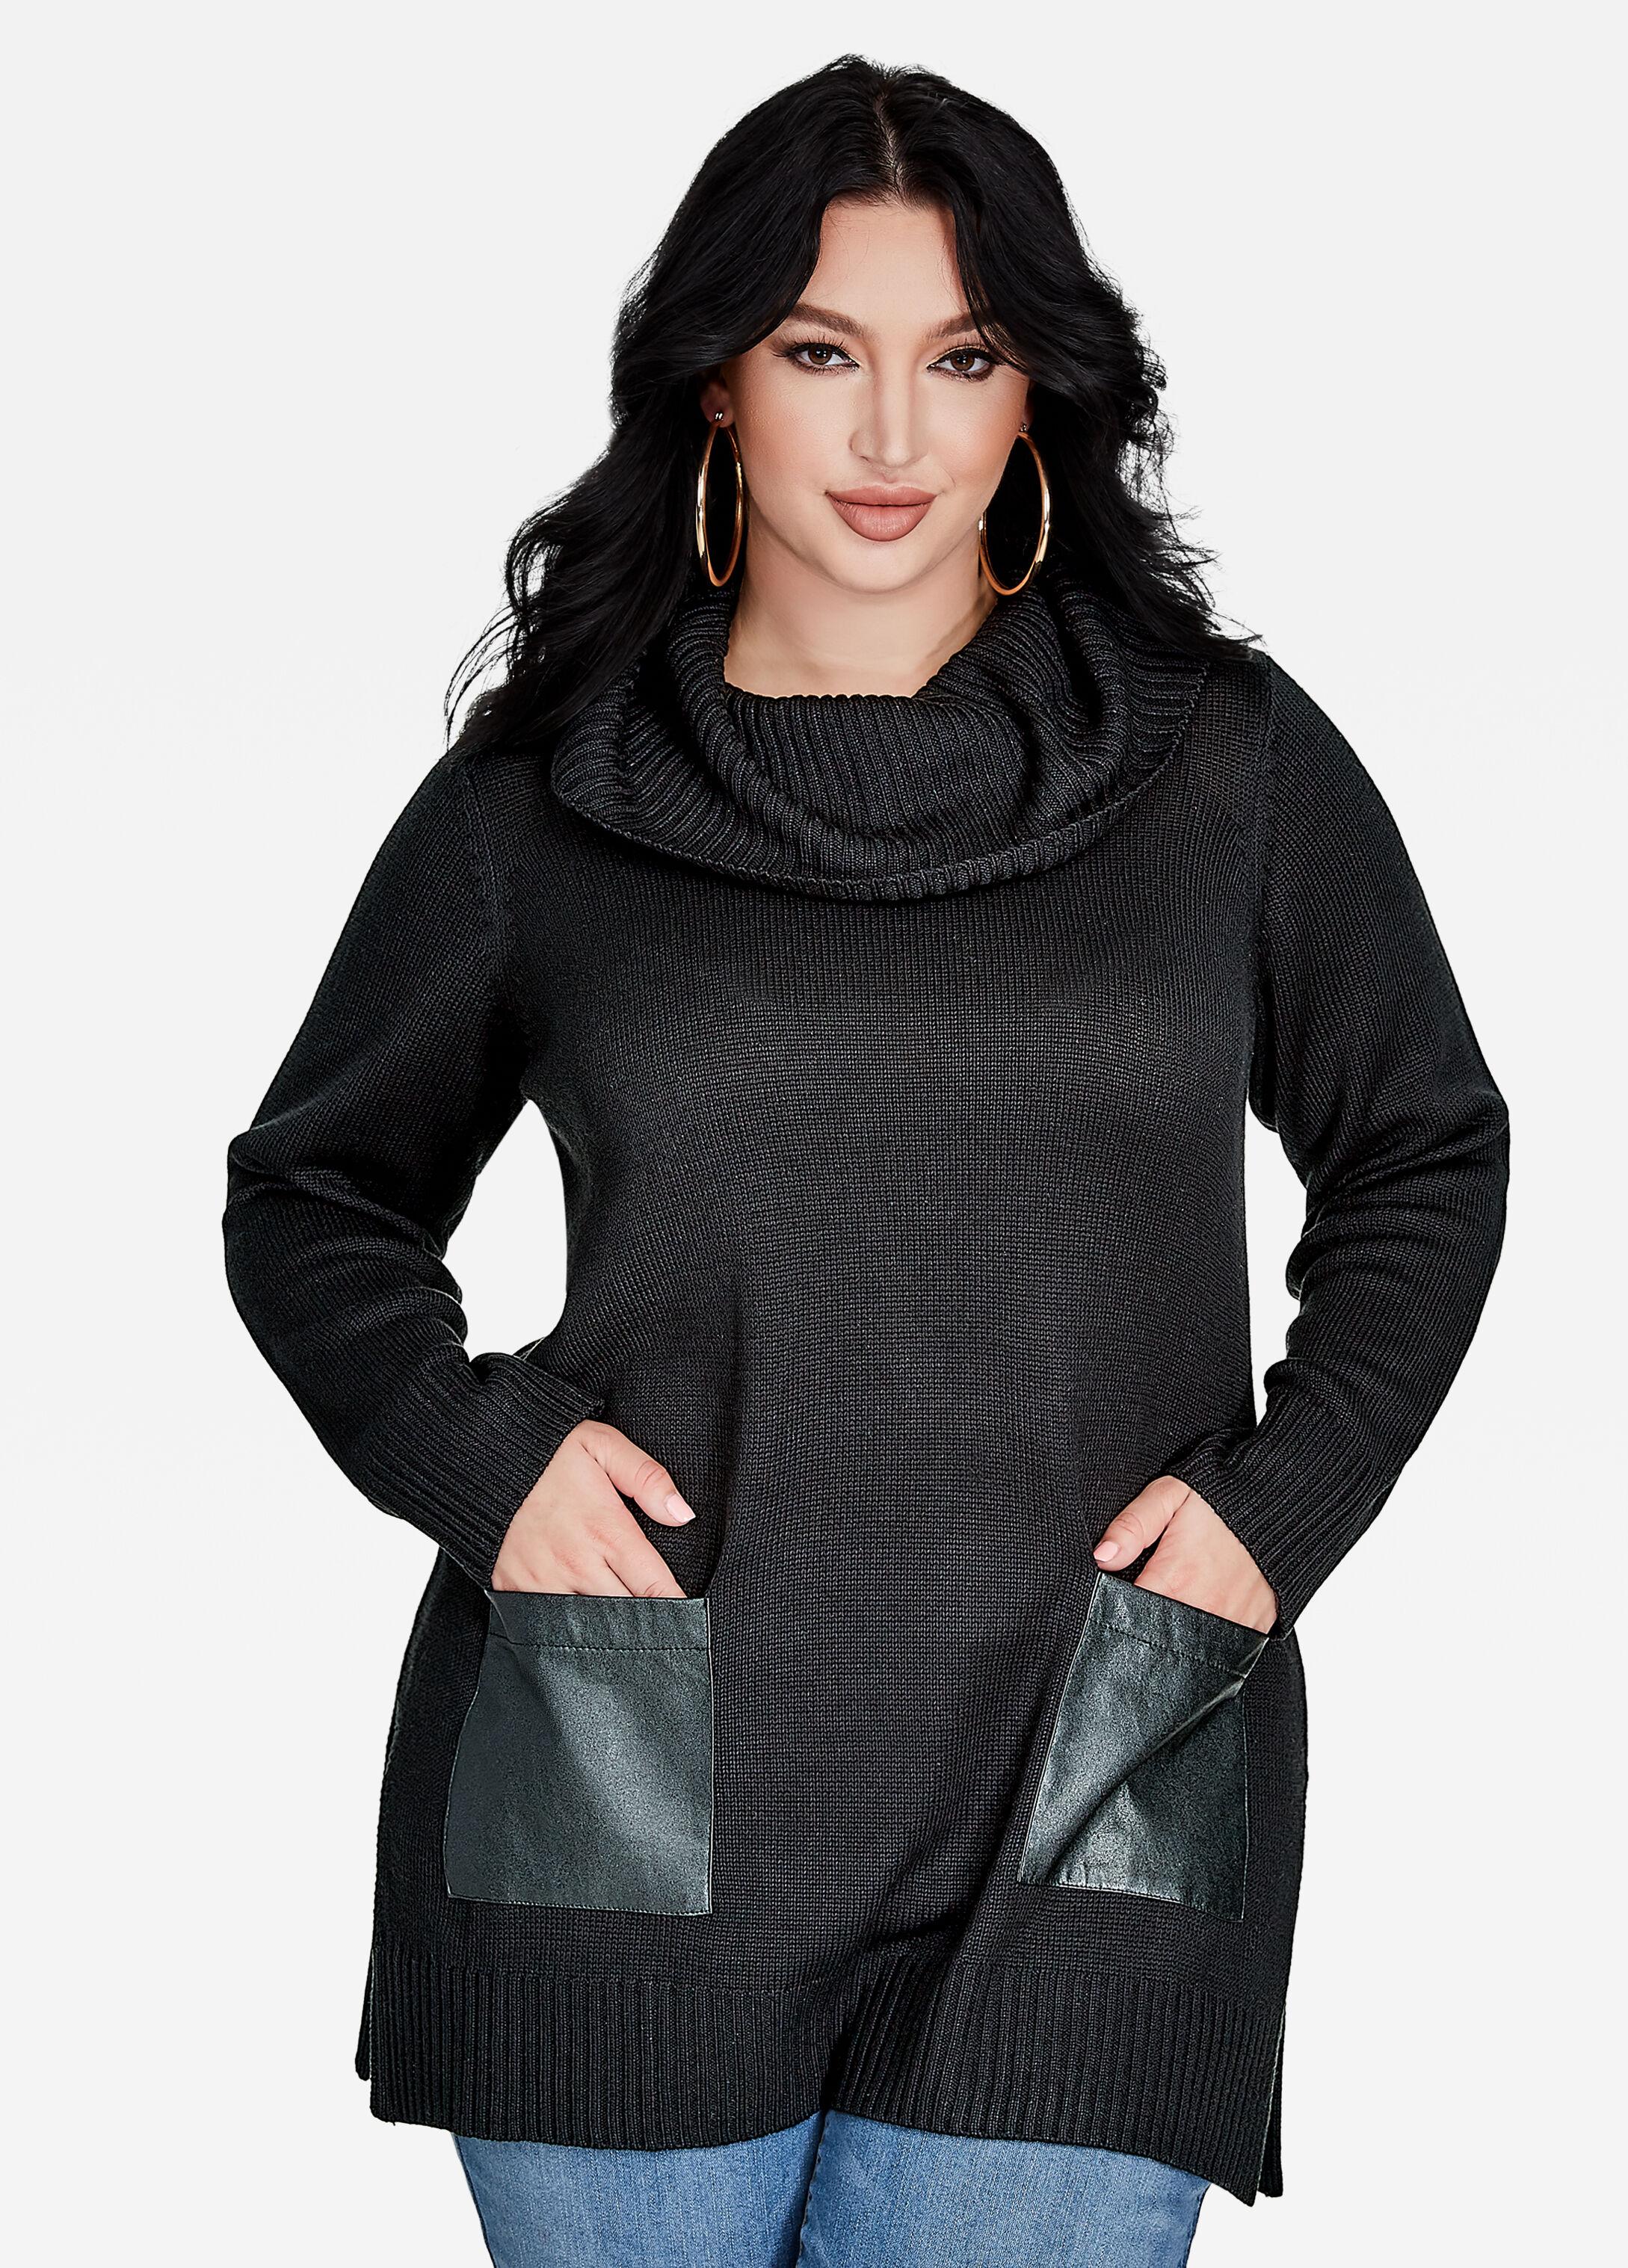 Plus size cowl neck sweater - faux leather pocket detail